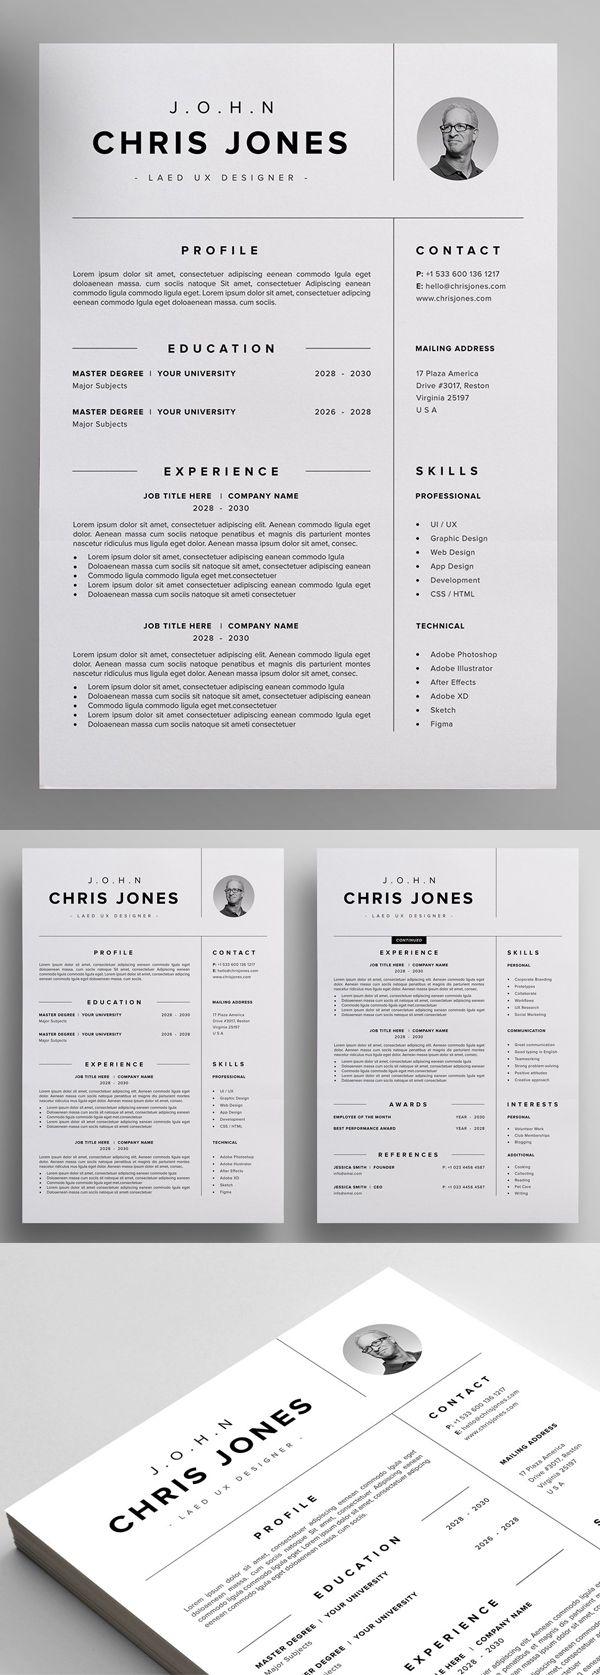 Resume Cv Minimalist Resume Template Resume Design Template Resume Design